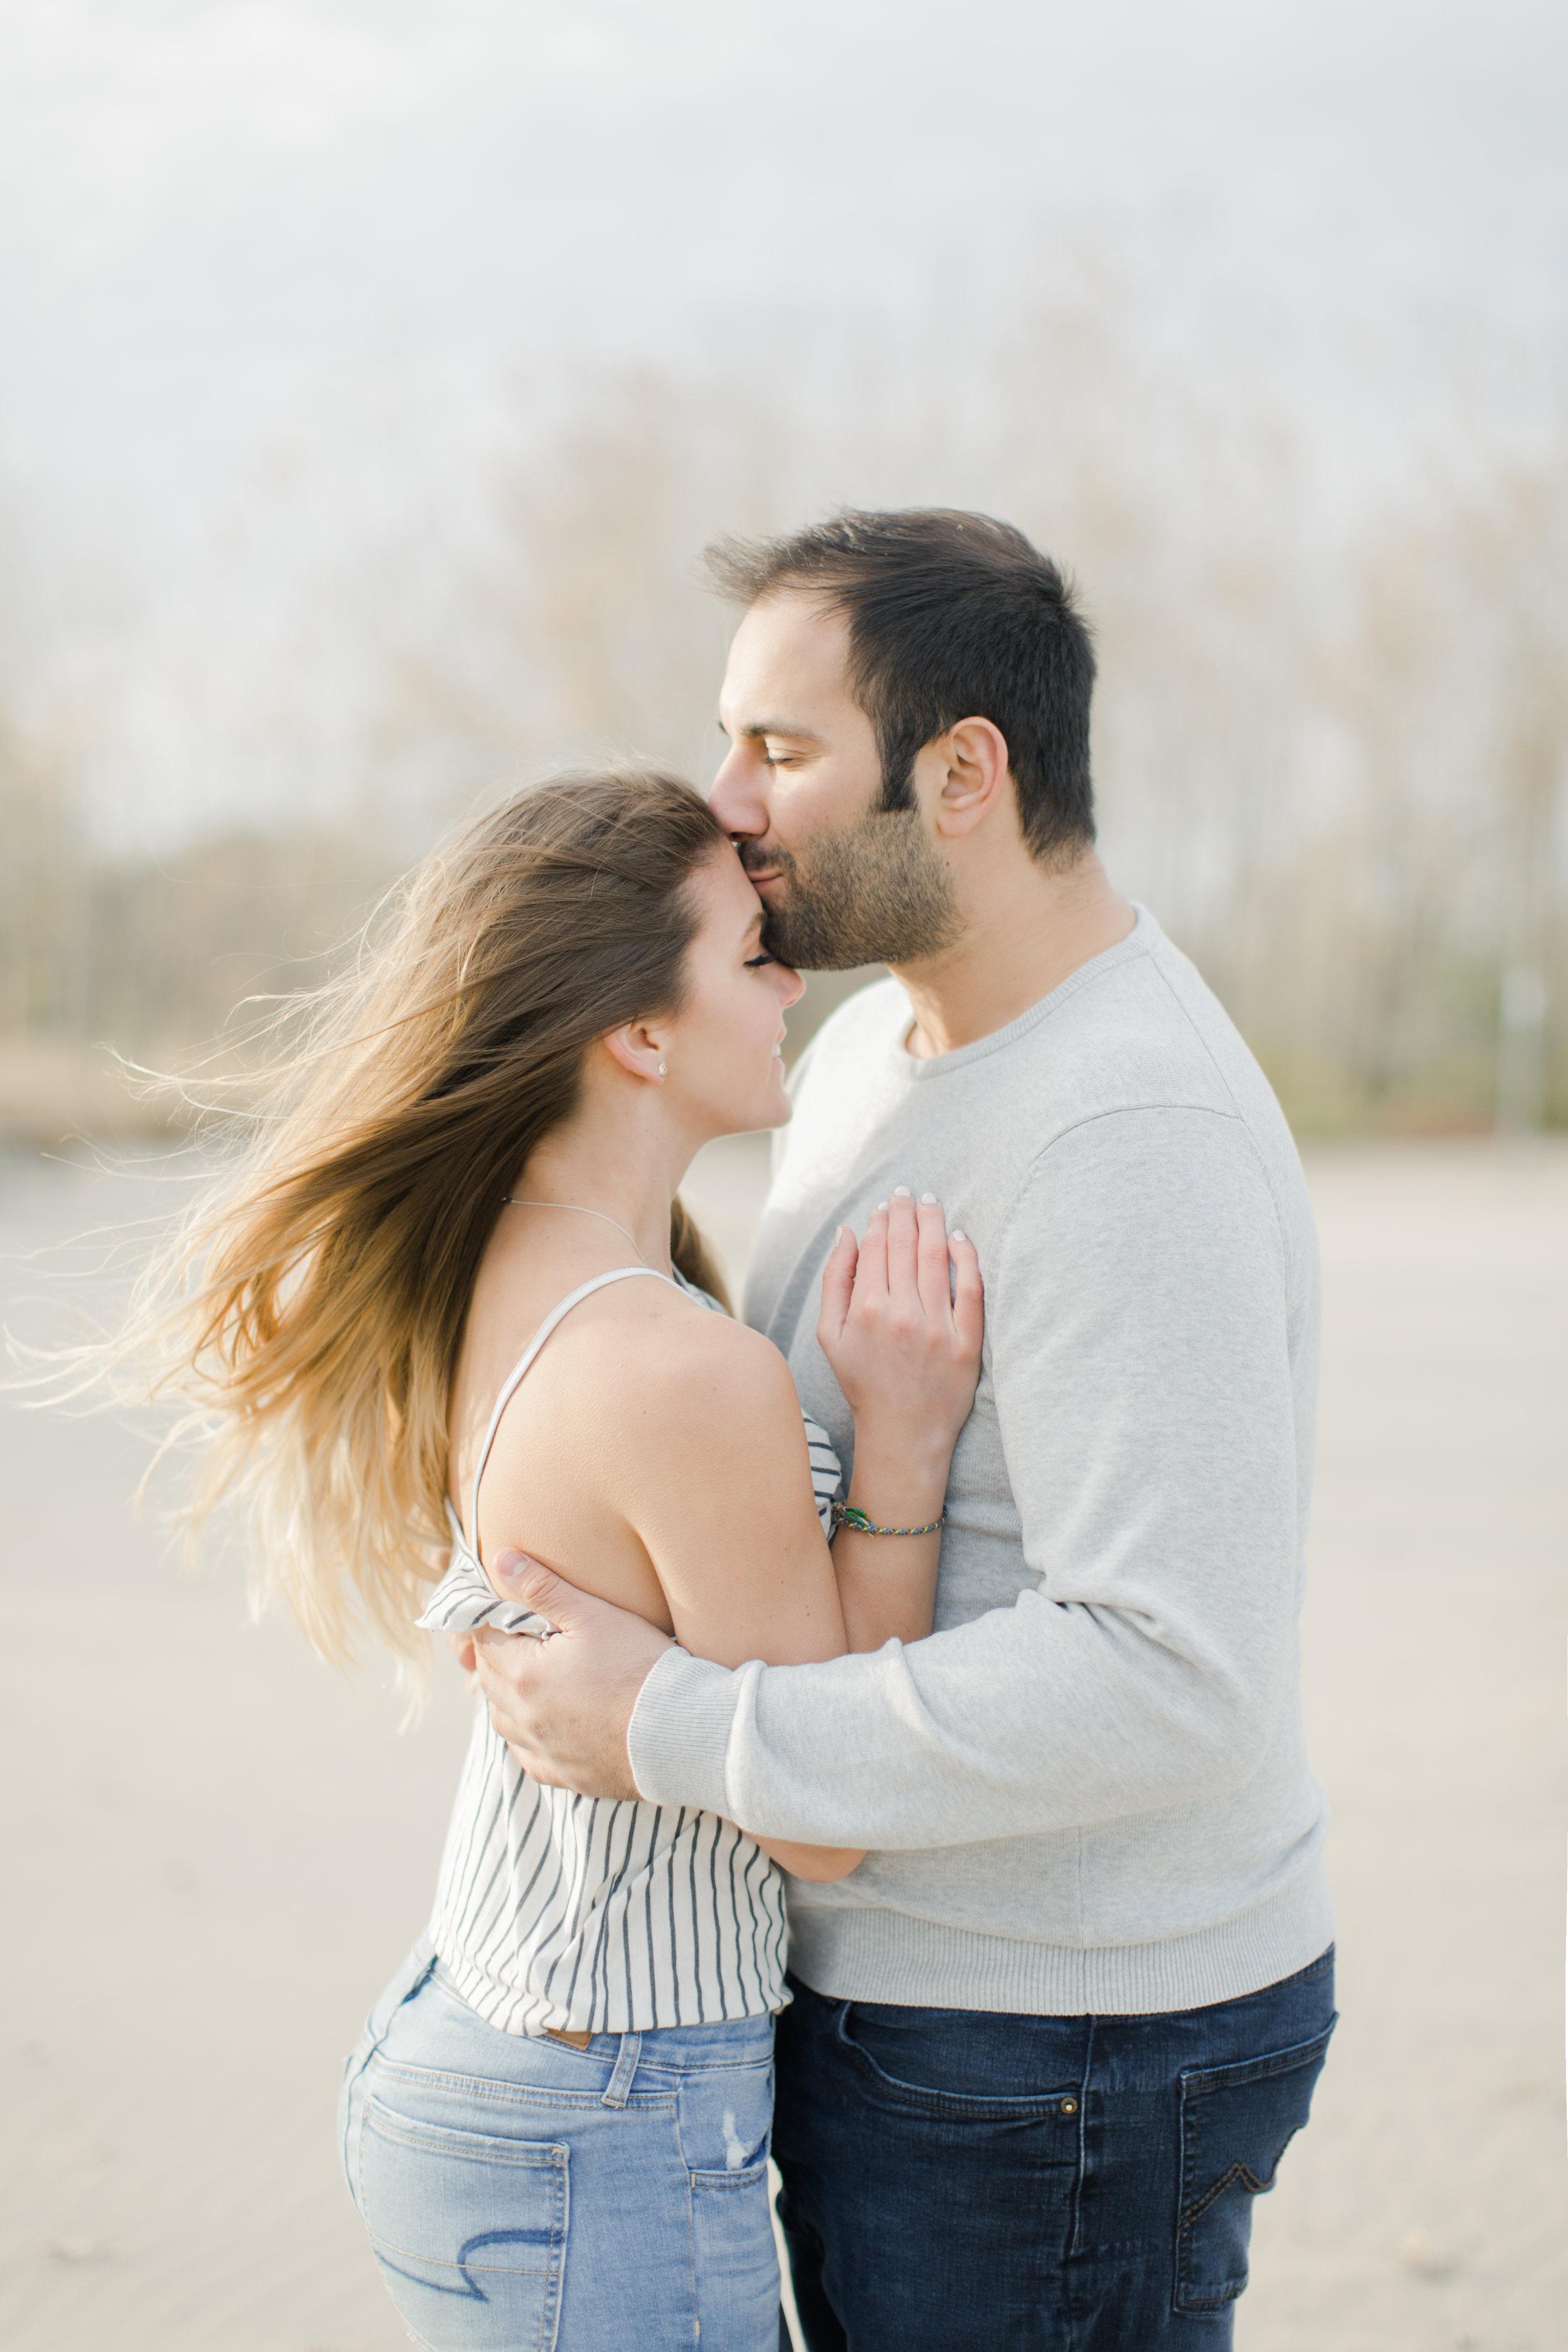 ashbridges-bay-toronto-wedding-photographer-soft-bright-pretty-pastel-richelle-hunter-lauren-miller-heather-chris-previews-4.jpg